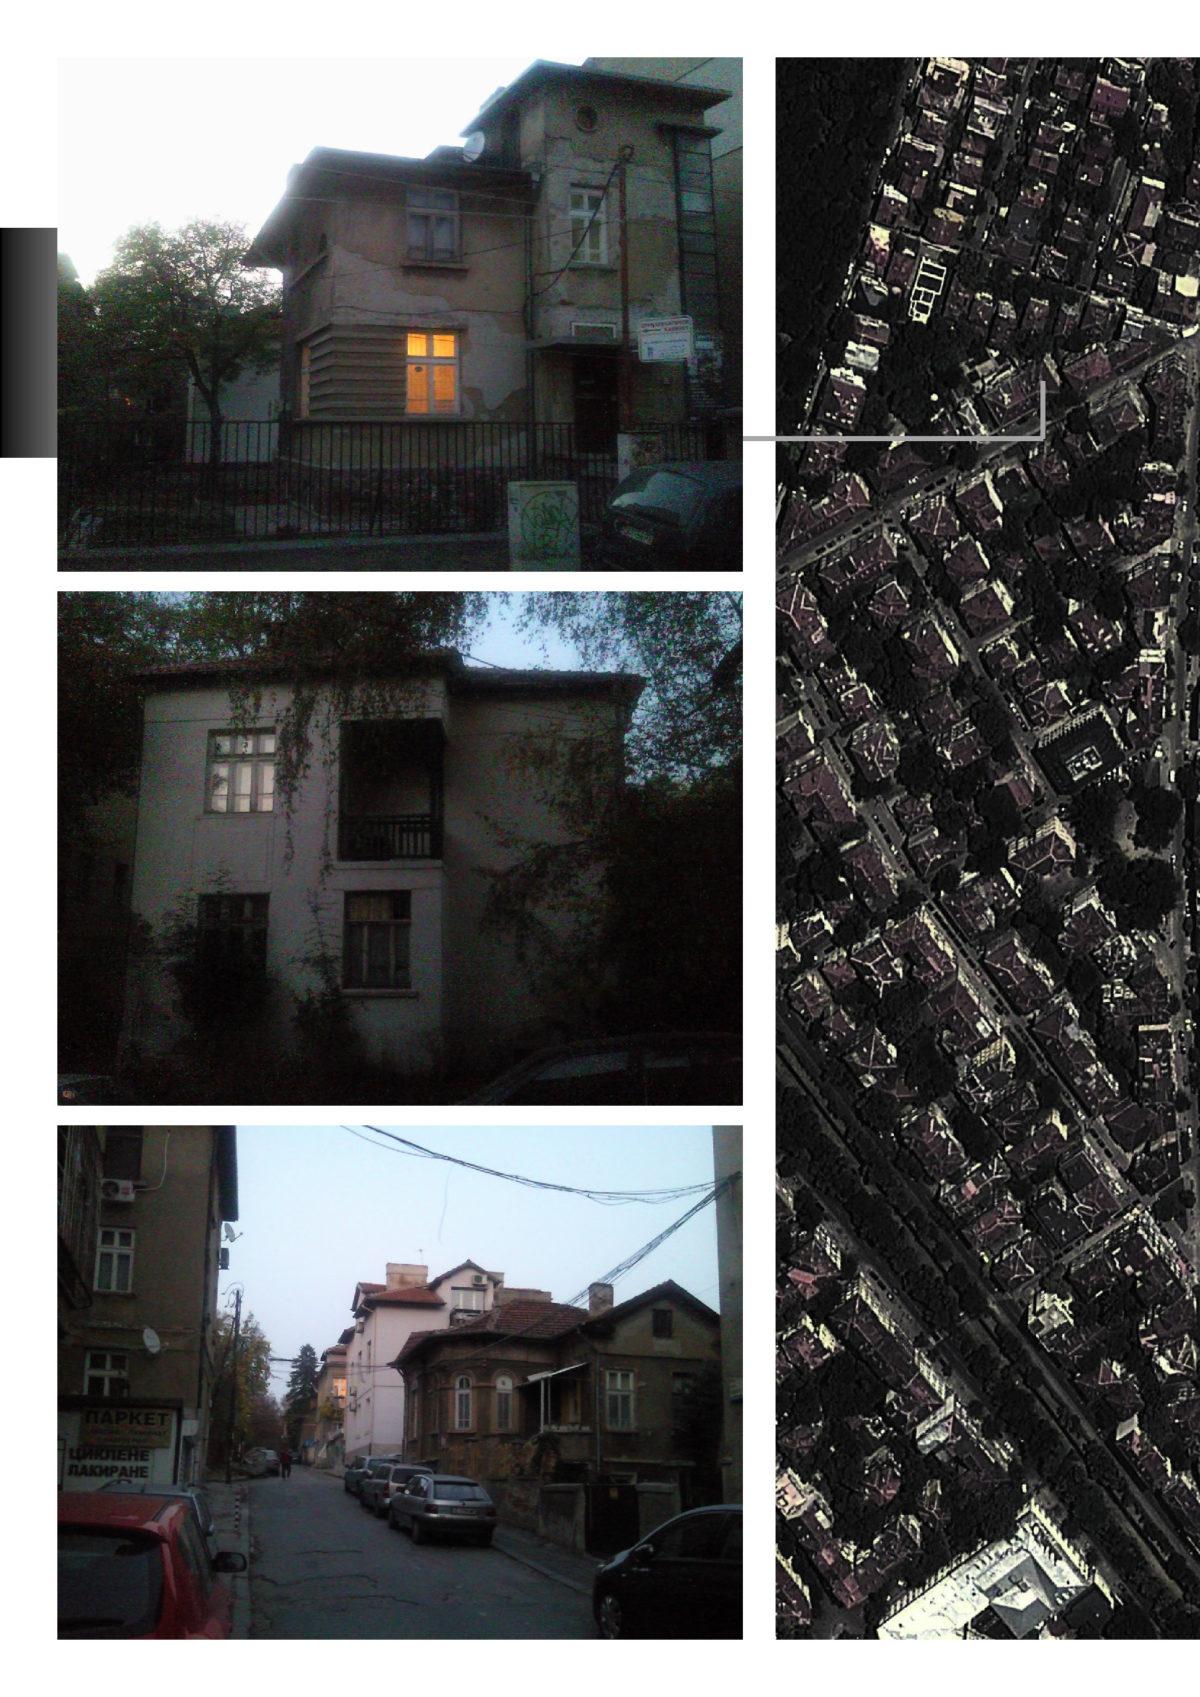 http://www.petkovstudio.com/bg/wp-content/uploads/2011/02/ivanasen_Page_08-1200x1697.jpg